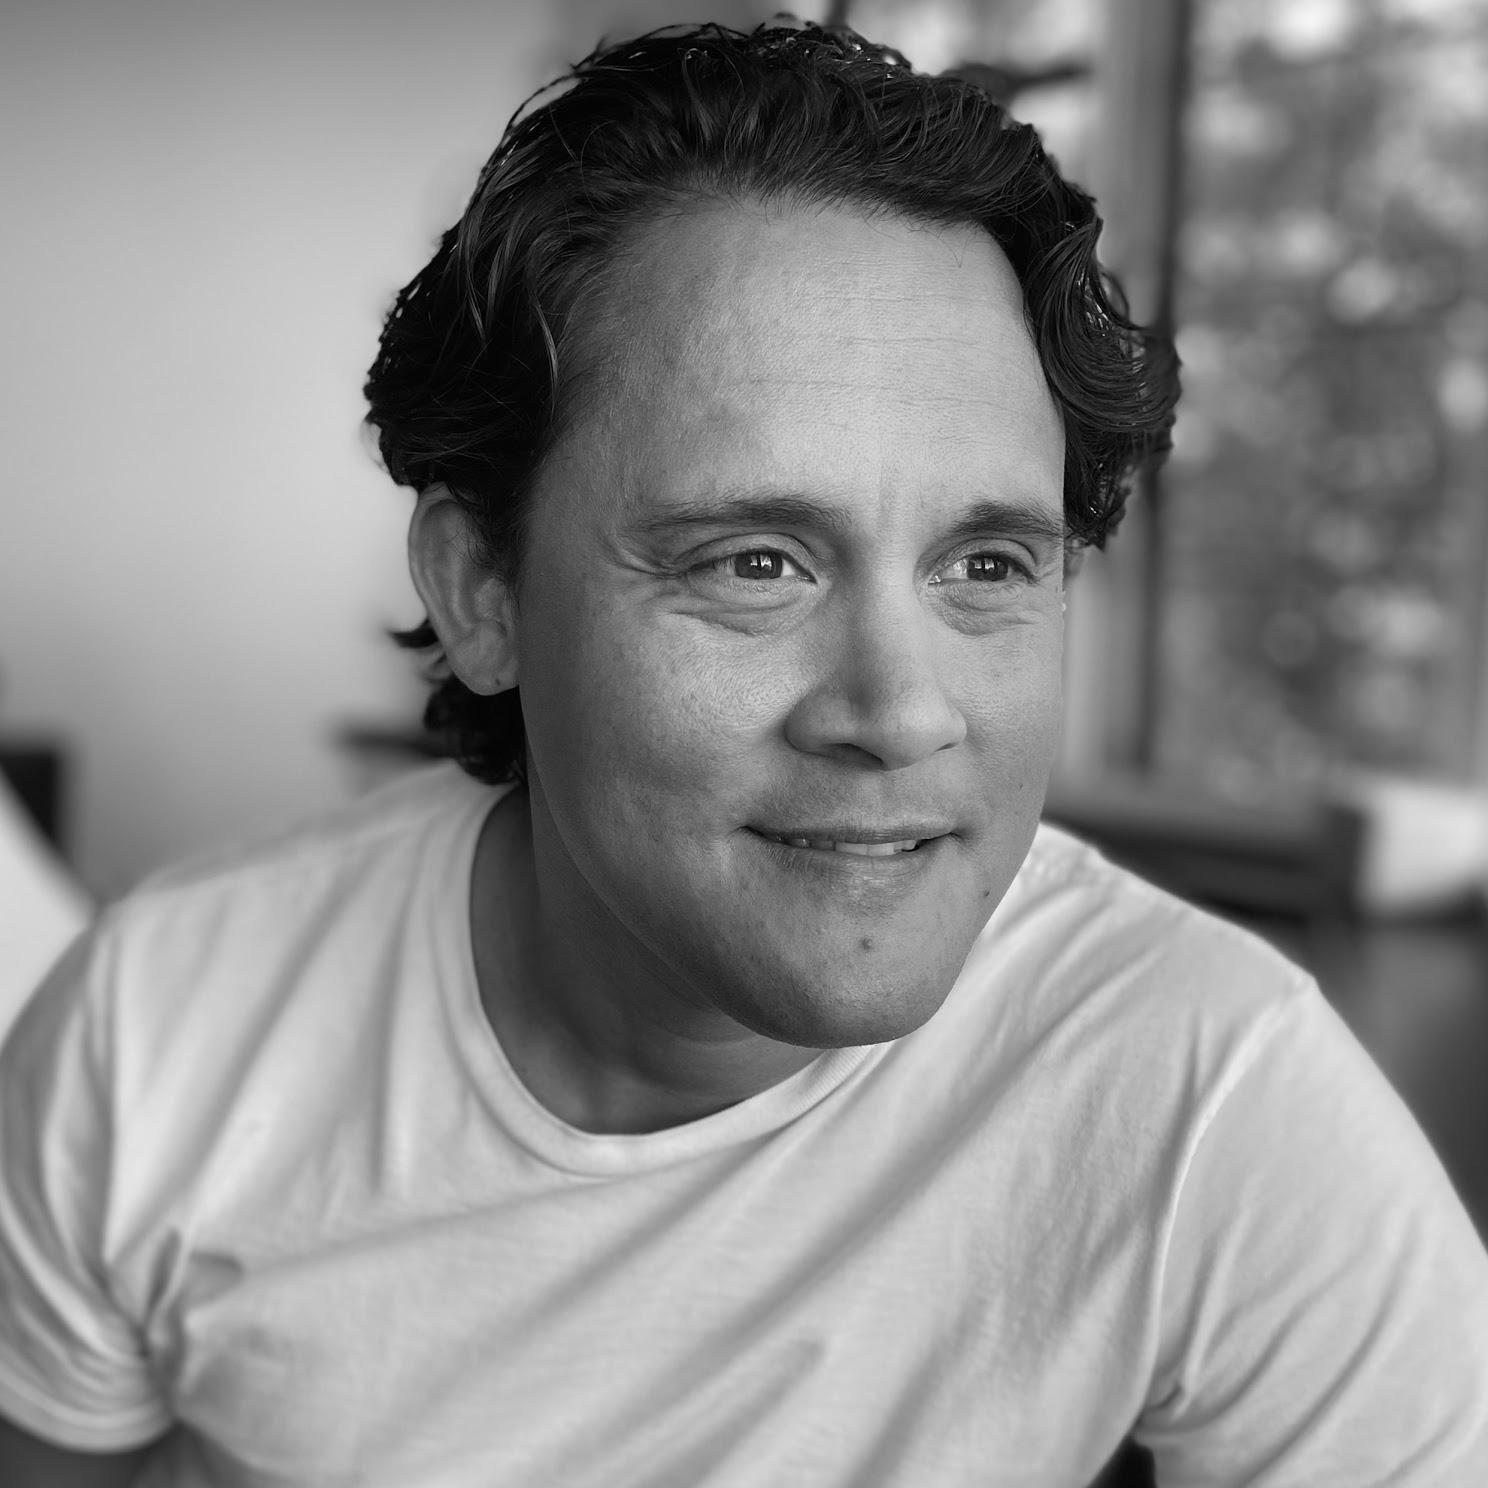 Adam K Batchelor interview on The Fantasy Network News